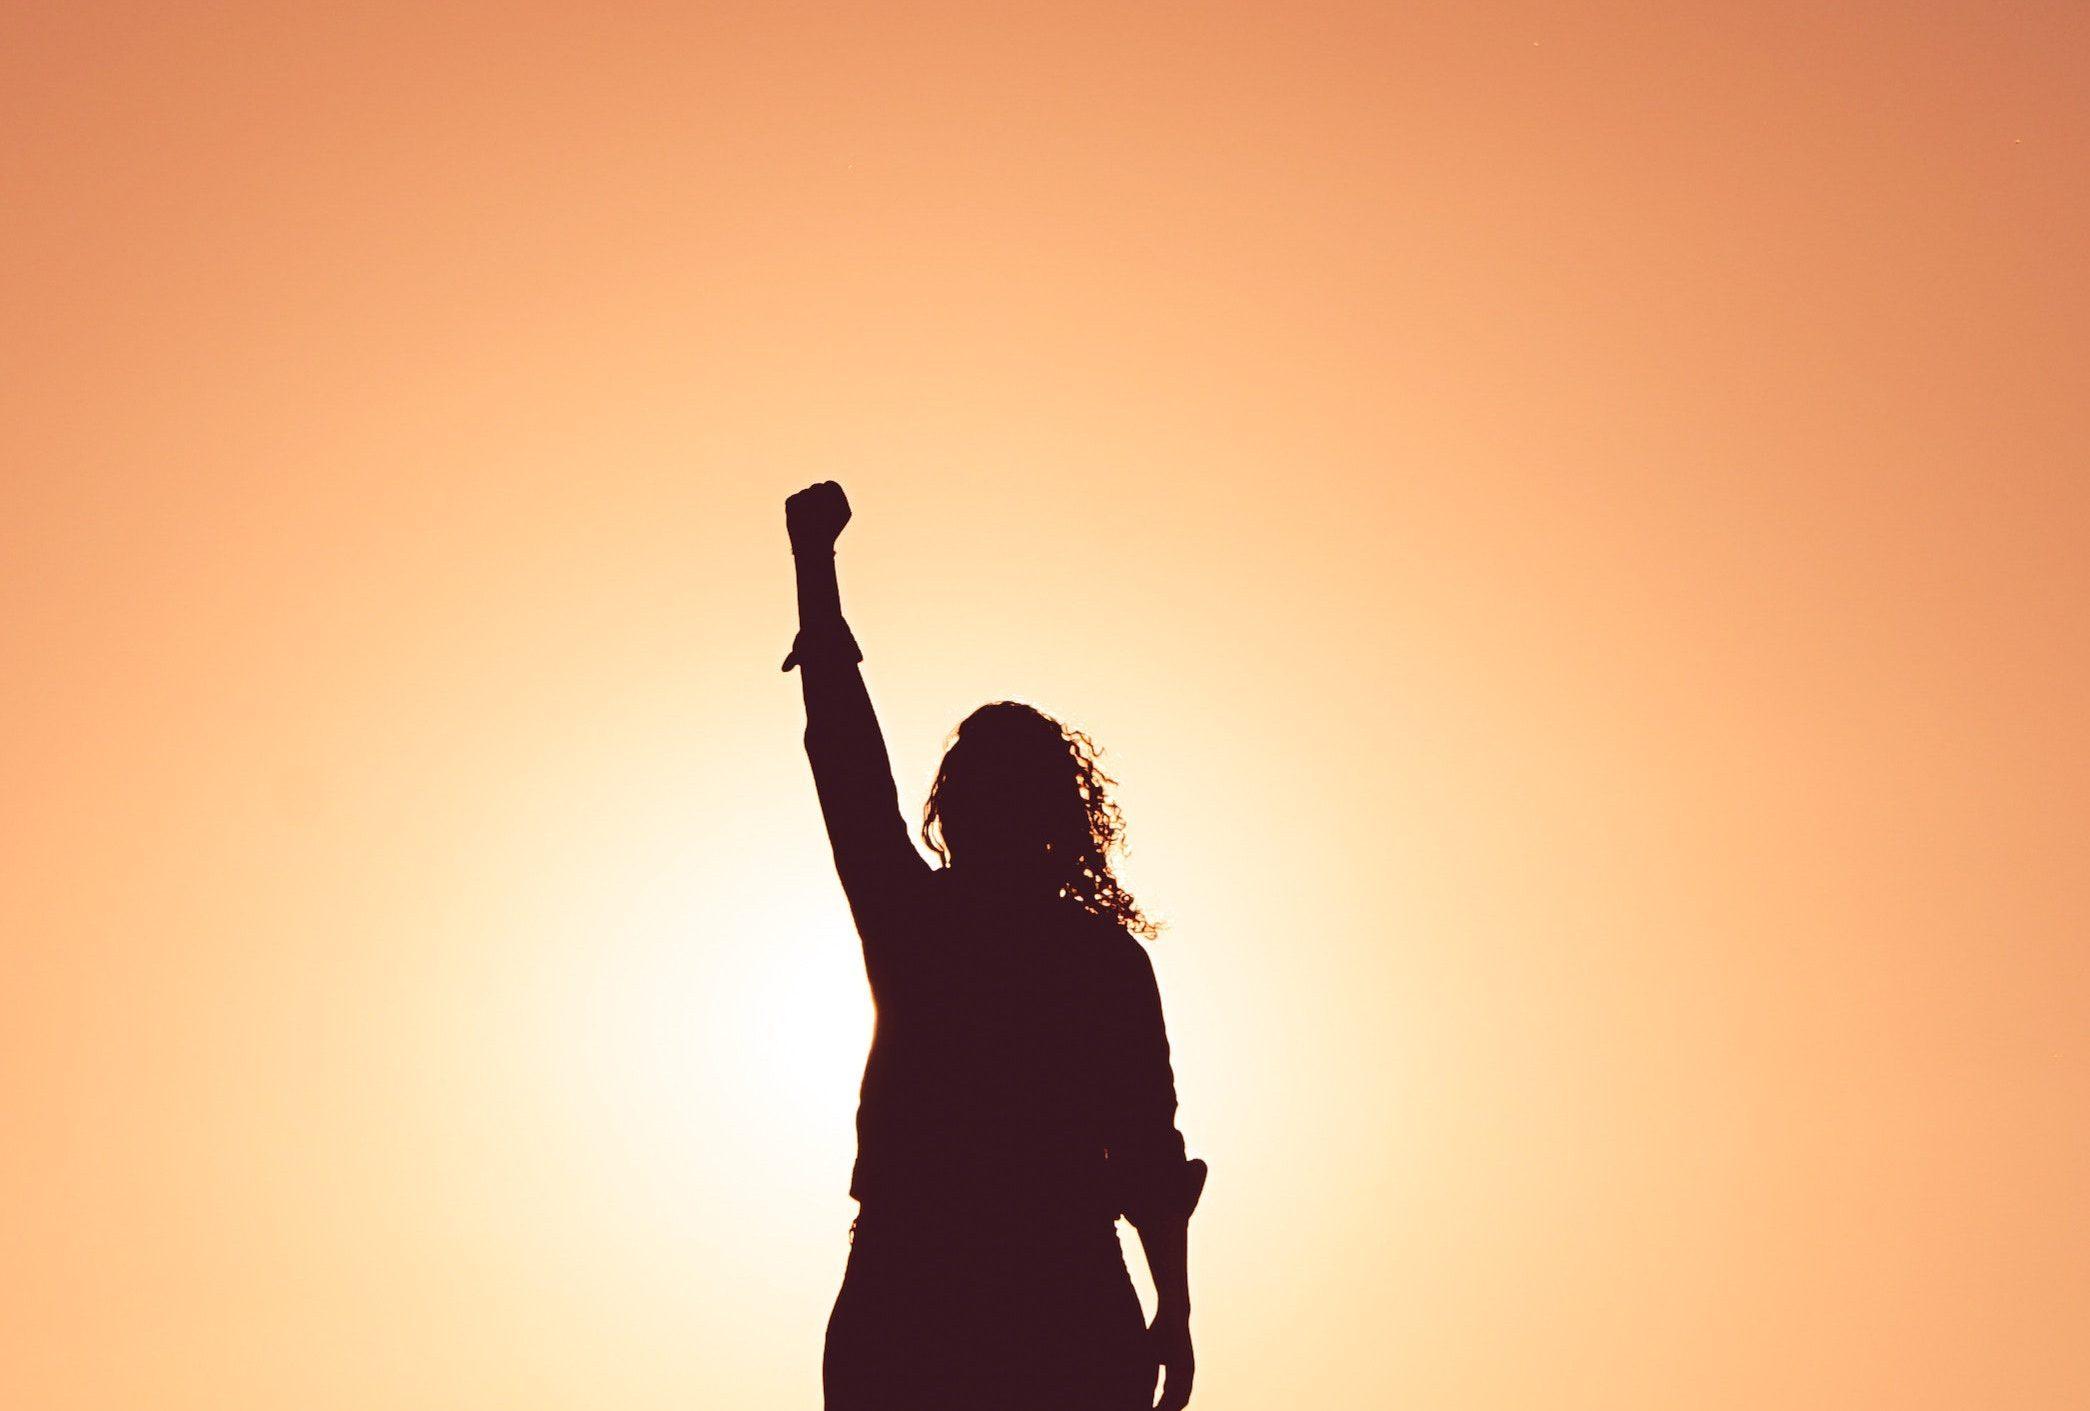 1. Empowered